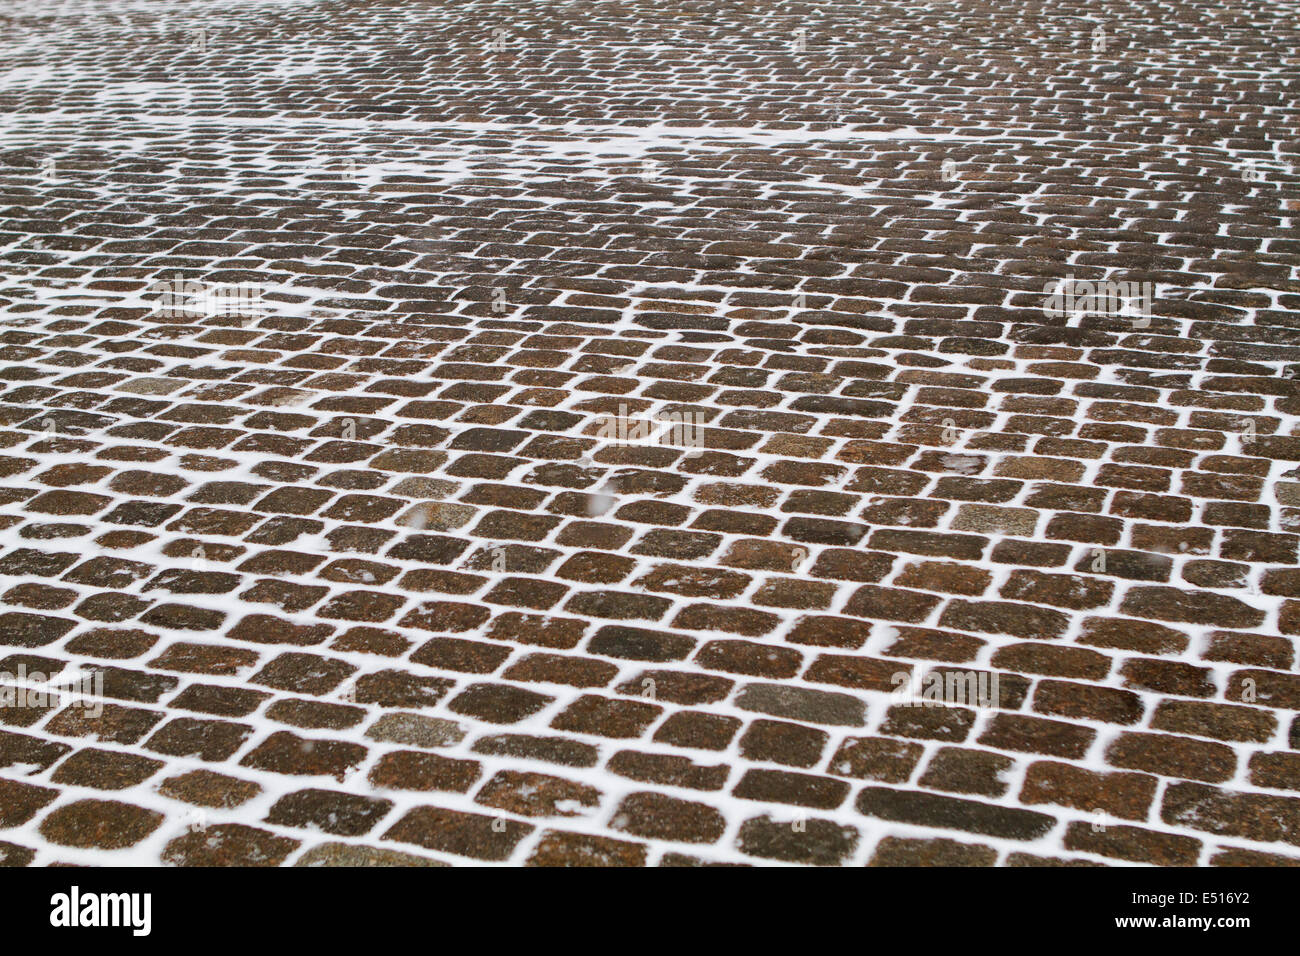 Closeup view on a cobblestone road pattern - Stock Image